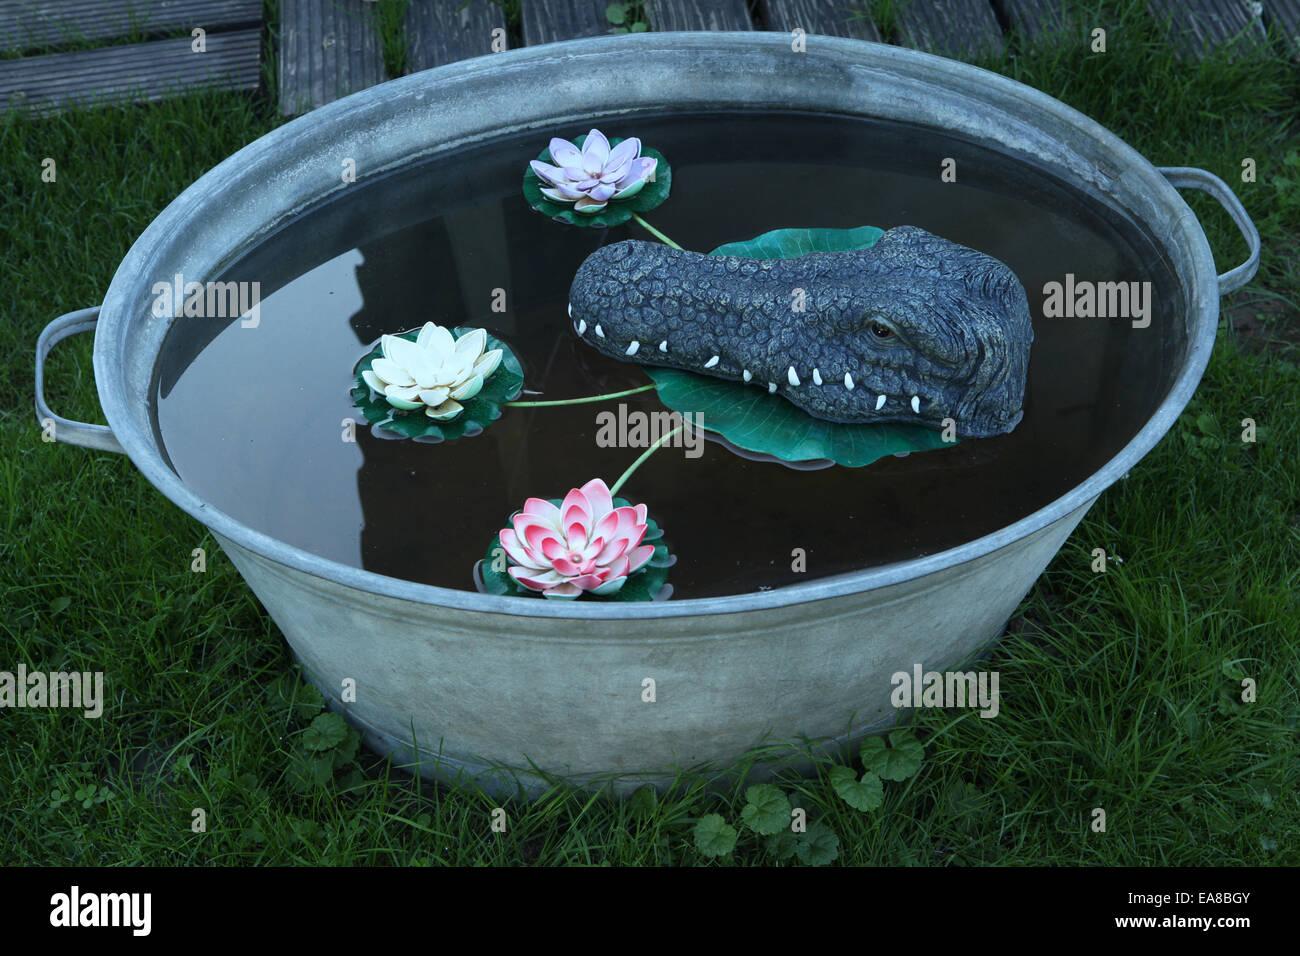 Plastic floating head of a crocodile in a wash tub. Kitsch example in Düsseldorf, North Rhine-Westphalia, Germany. - Stock Image